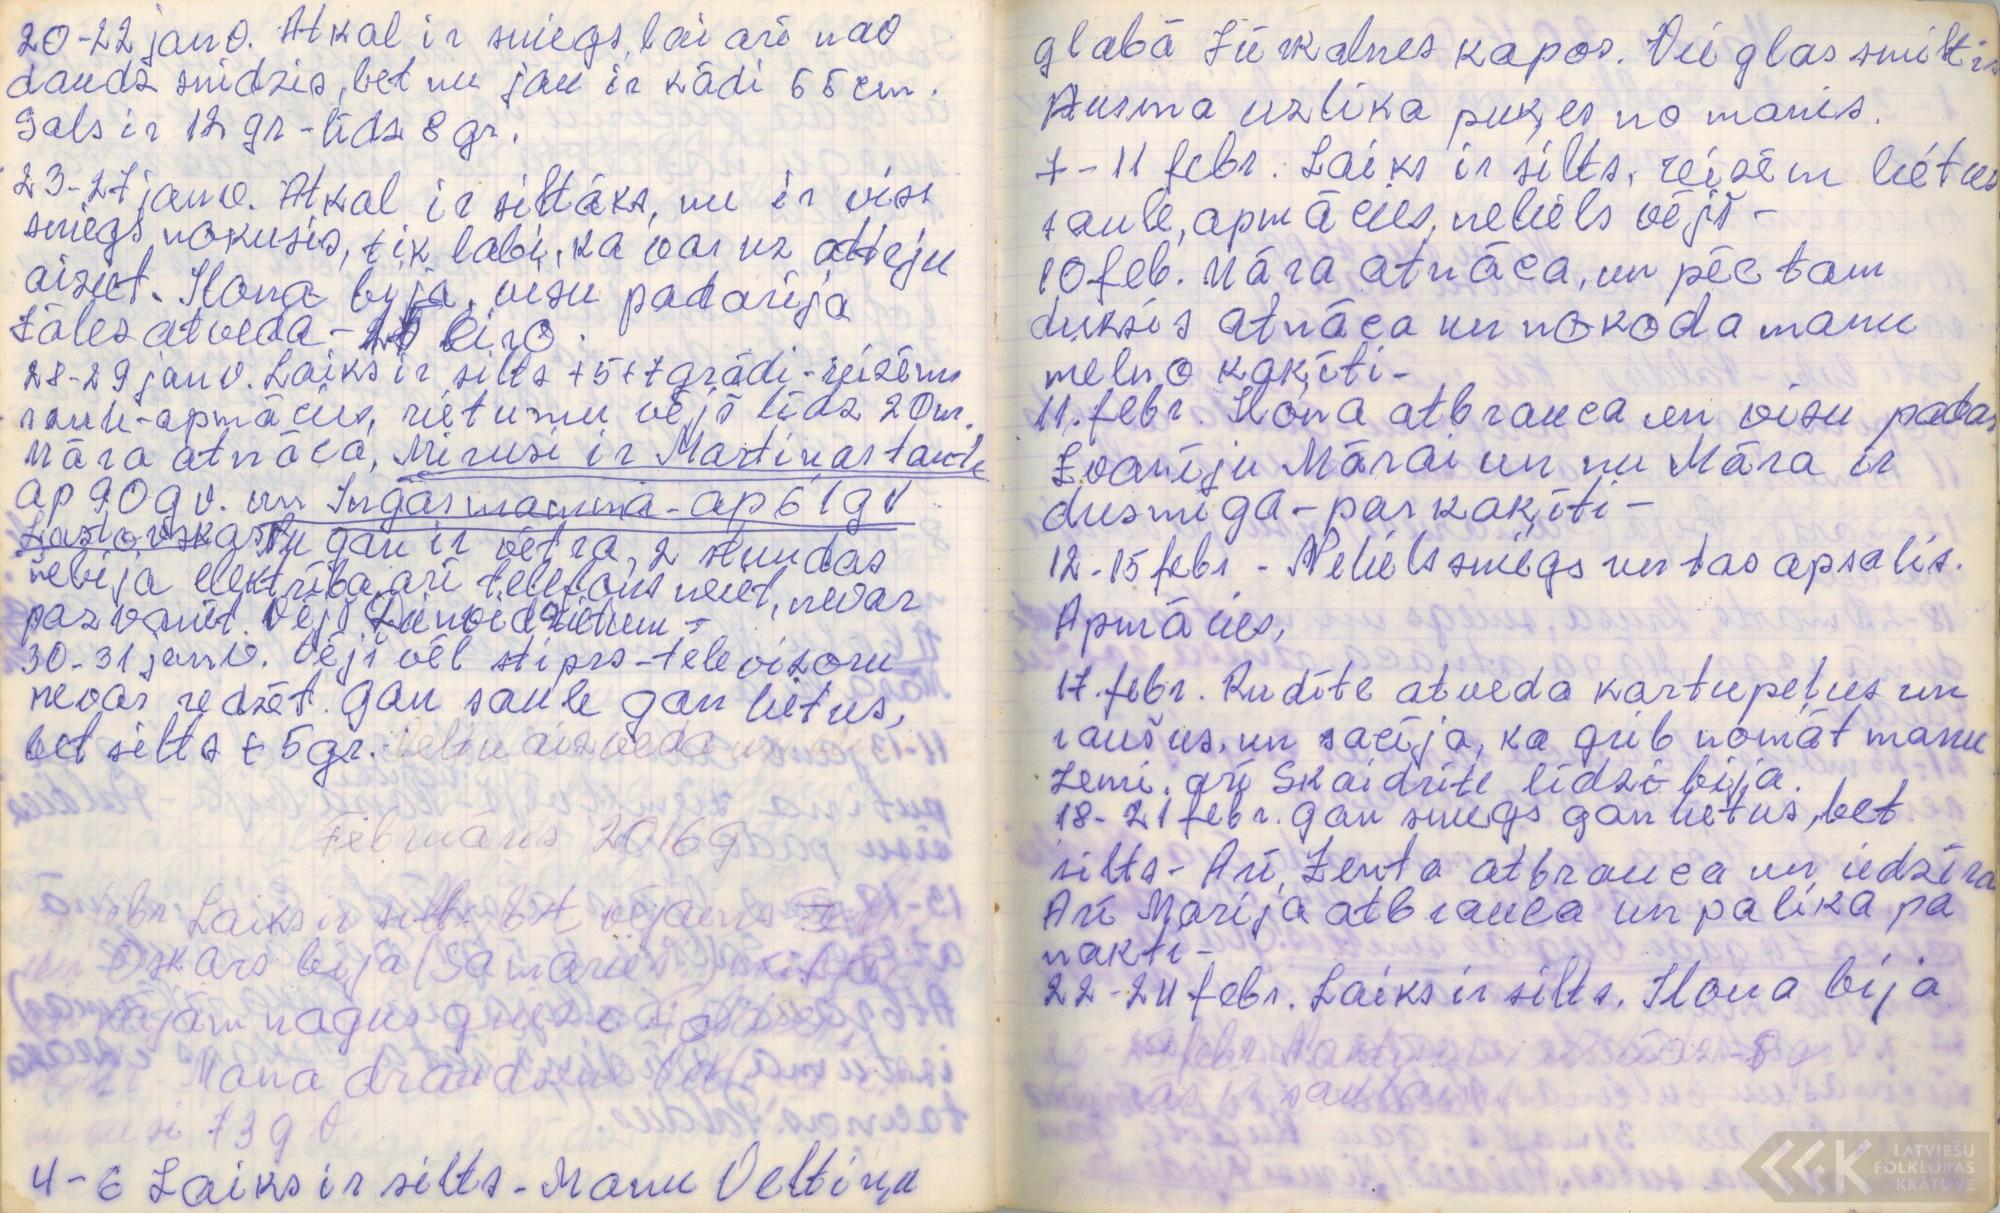 Ak139-Zigridas-Paegles-dienasgramatas-06-0098